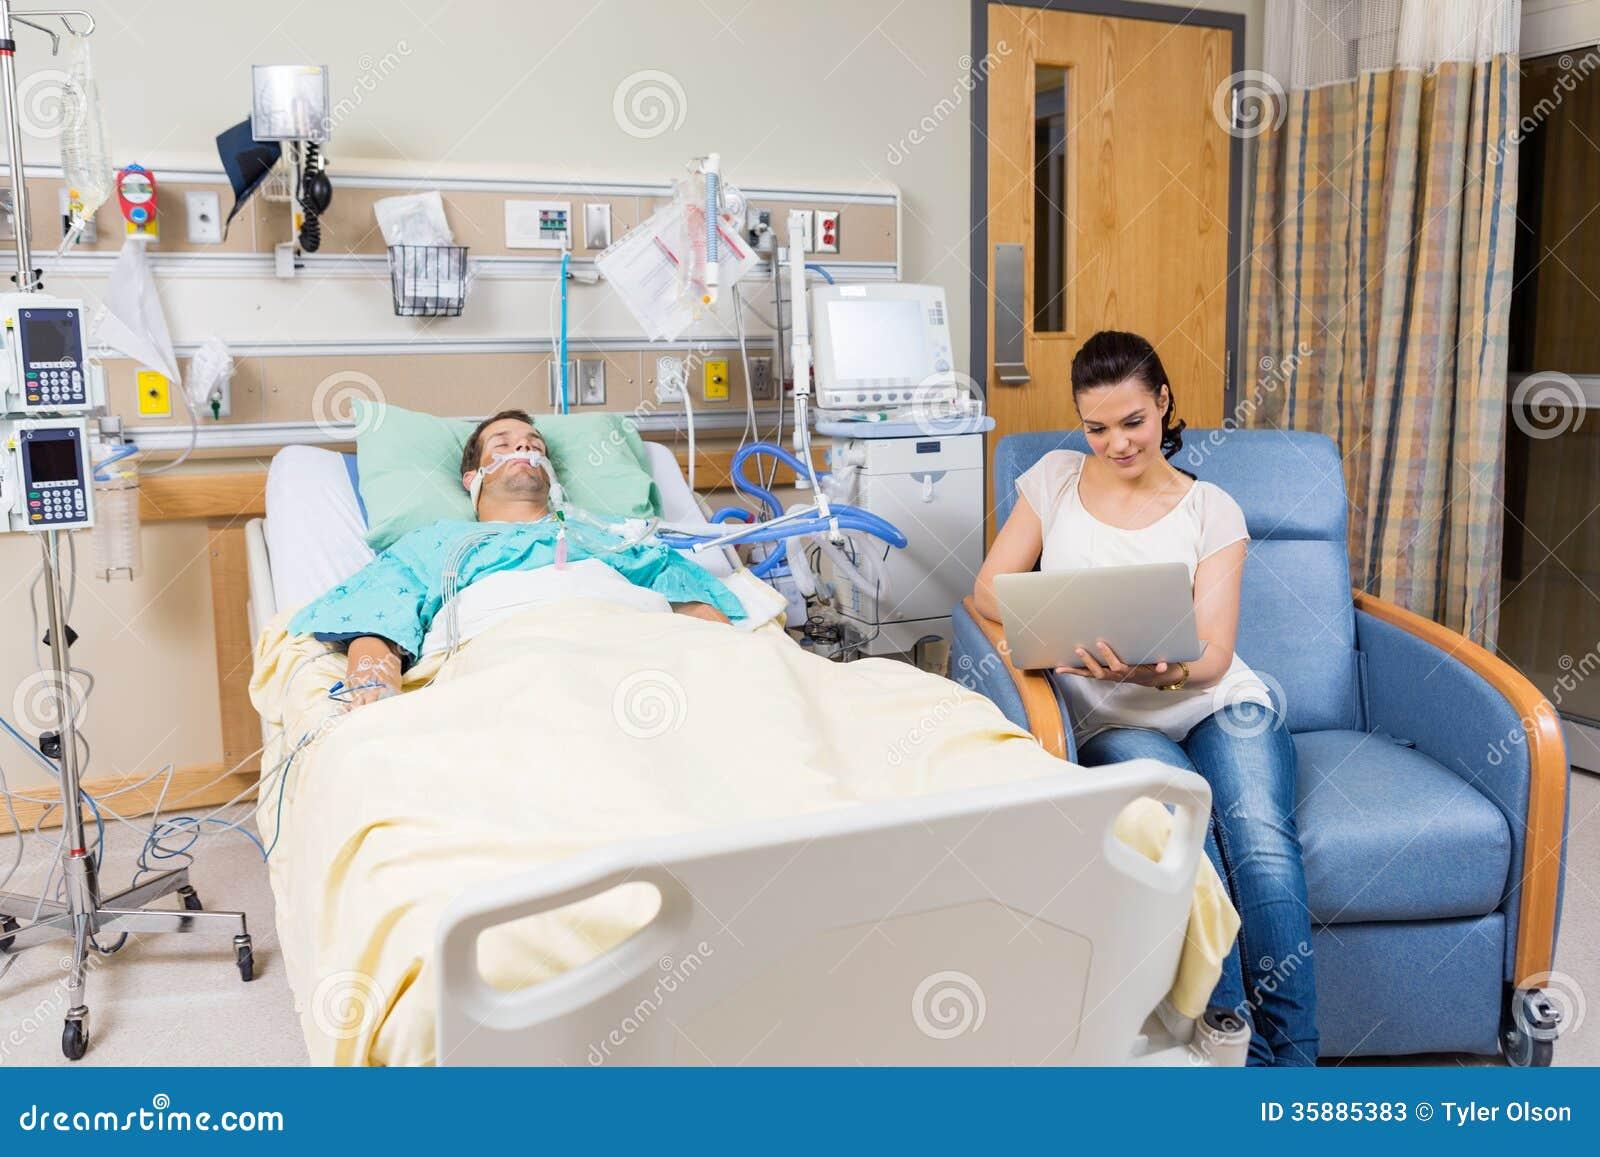 Woman S Hospital Of Houston Emergency Room